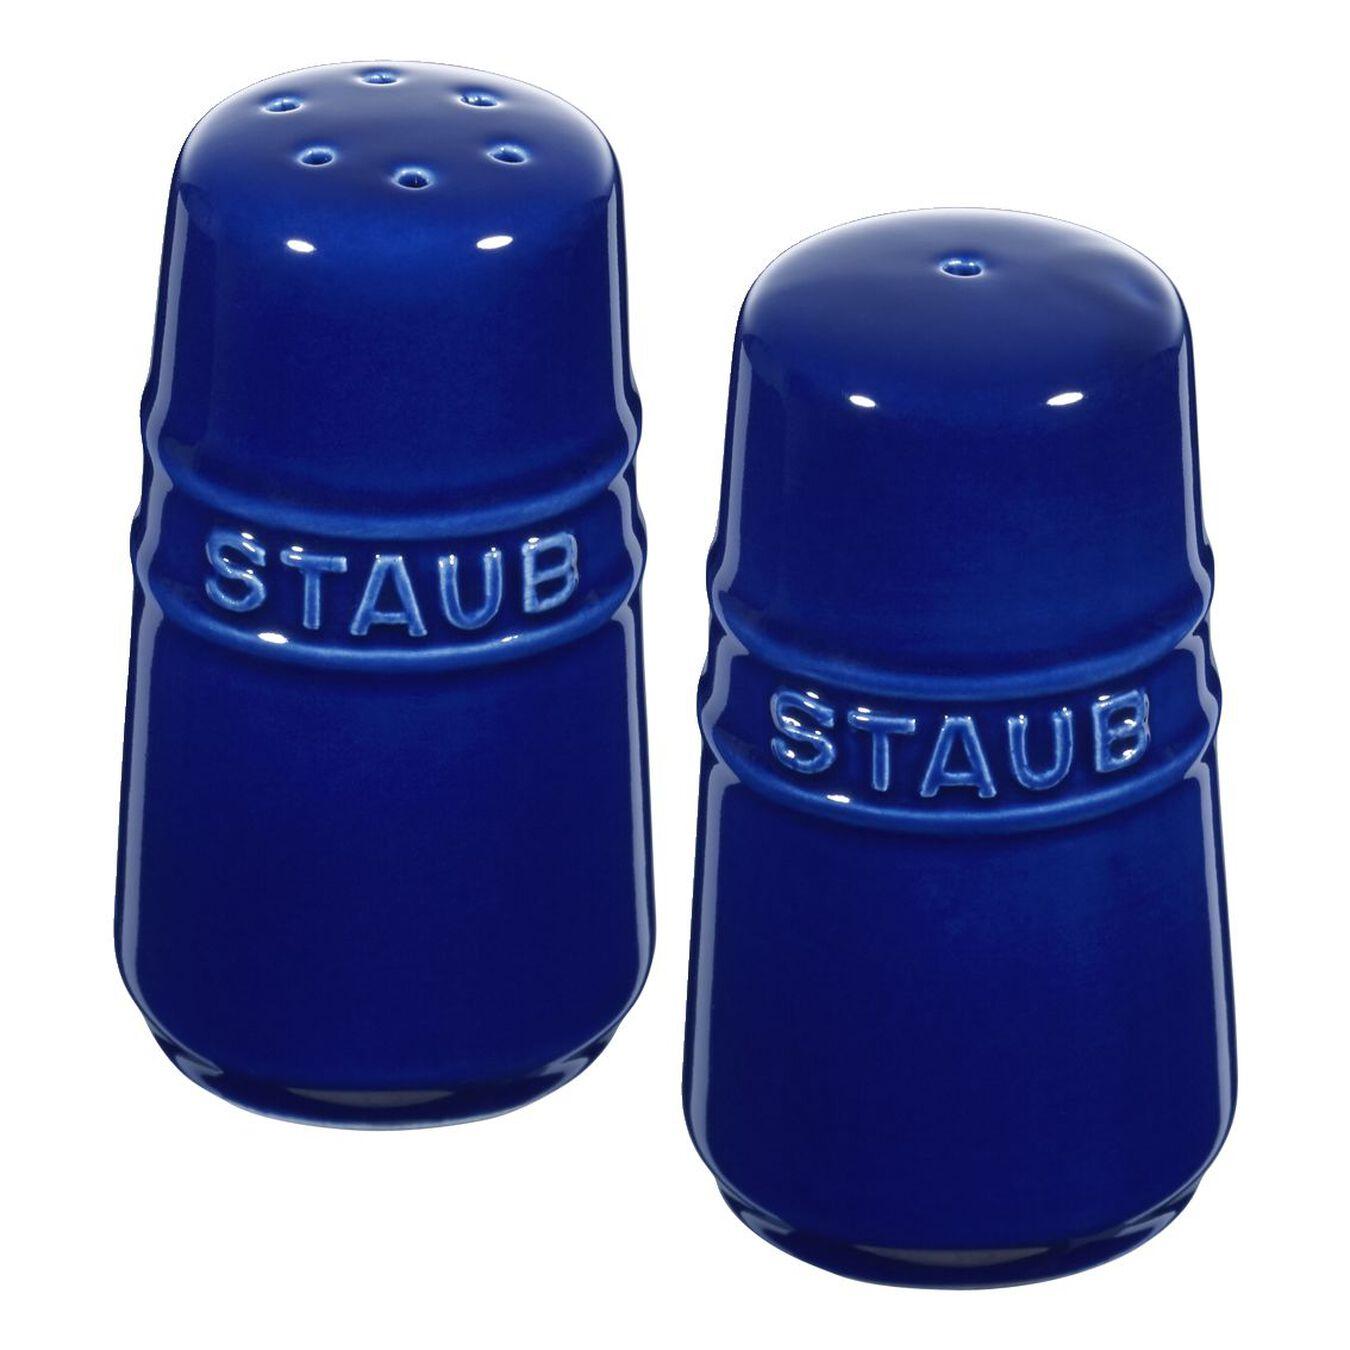 7 cm Ceramic Salt and pepper shaker, Dark-Blue,,large 1